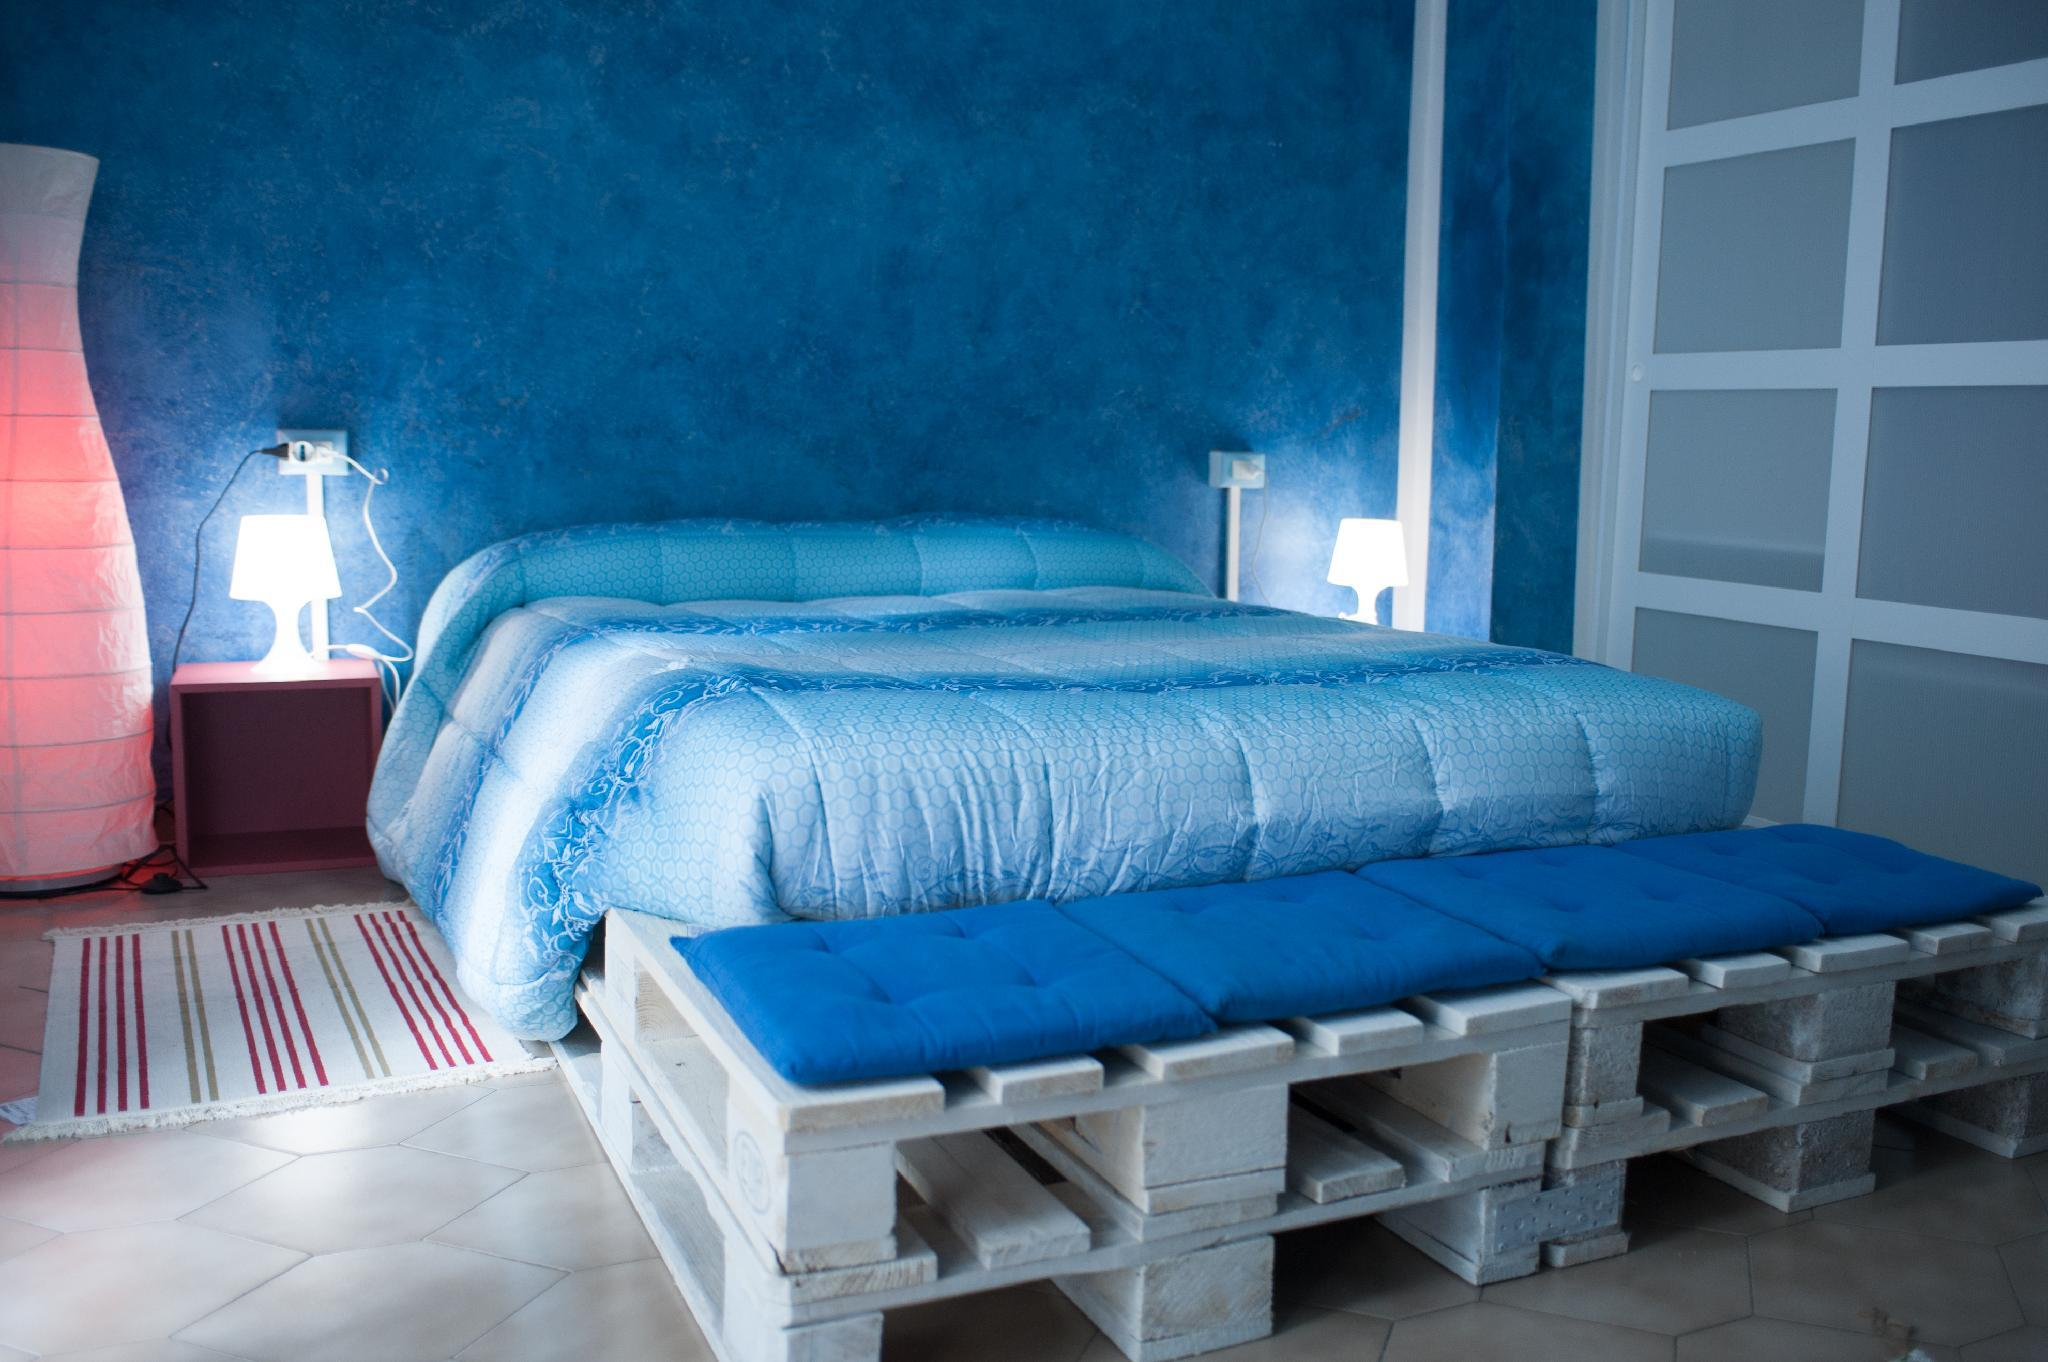 BandB Casa Tua. Original Rooms Await.....